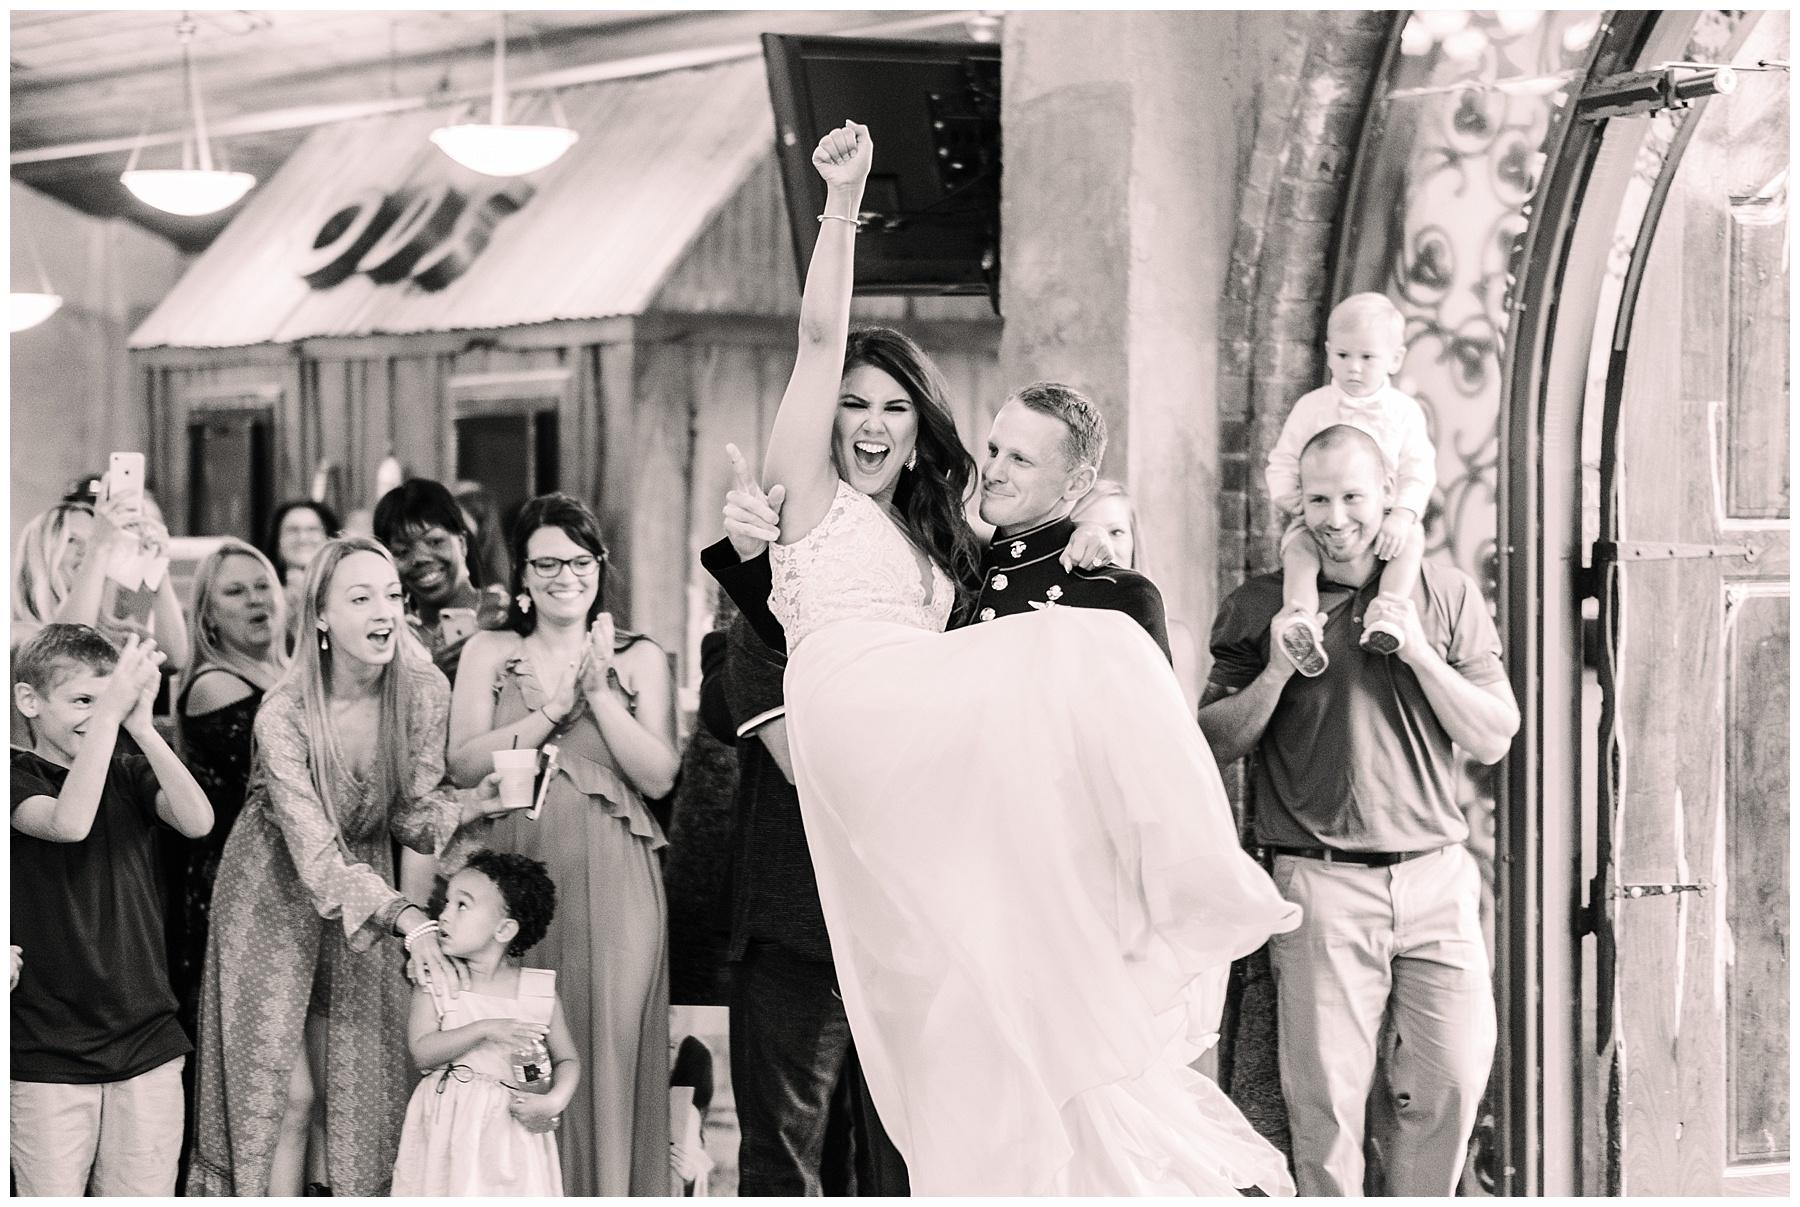 Austin Wedding Photographer, Austin Wedding, Austin Texas Wedding, Austin Texas Wedding Photographer, ATX Wedding, ATX Wedding Photographer, Austin TX Engagement Photographer, Military Wedding, Military Engagement Photographer, Wedding Photographer, Wedding, Engagement Photographer, Engagements, Military Weddings